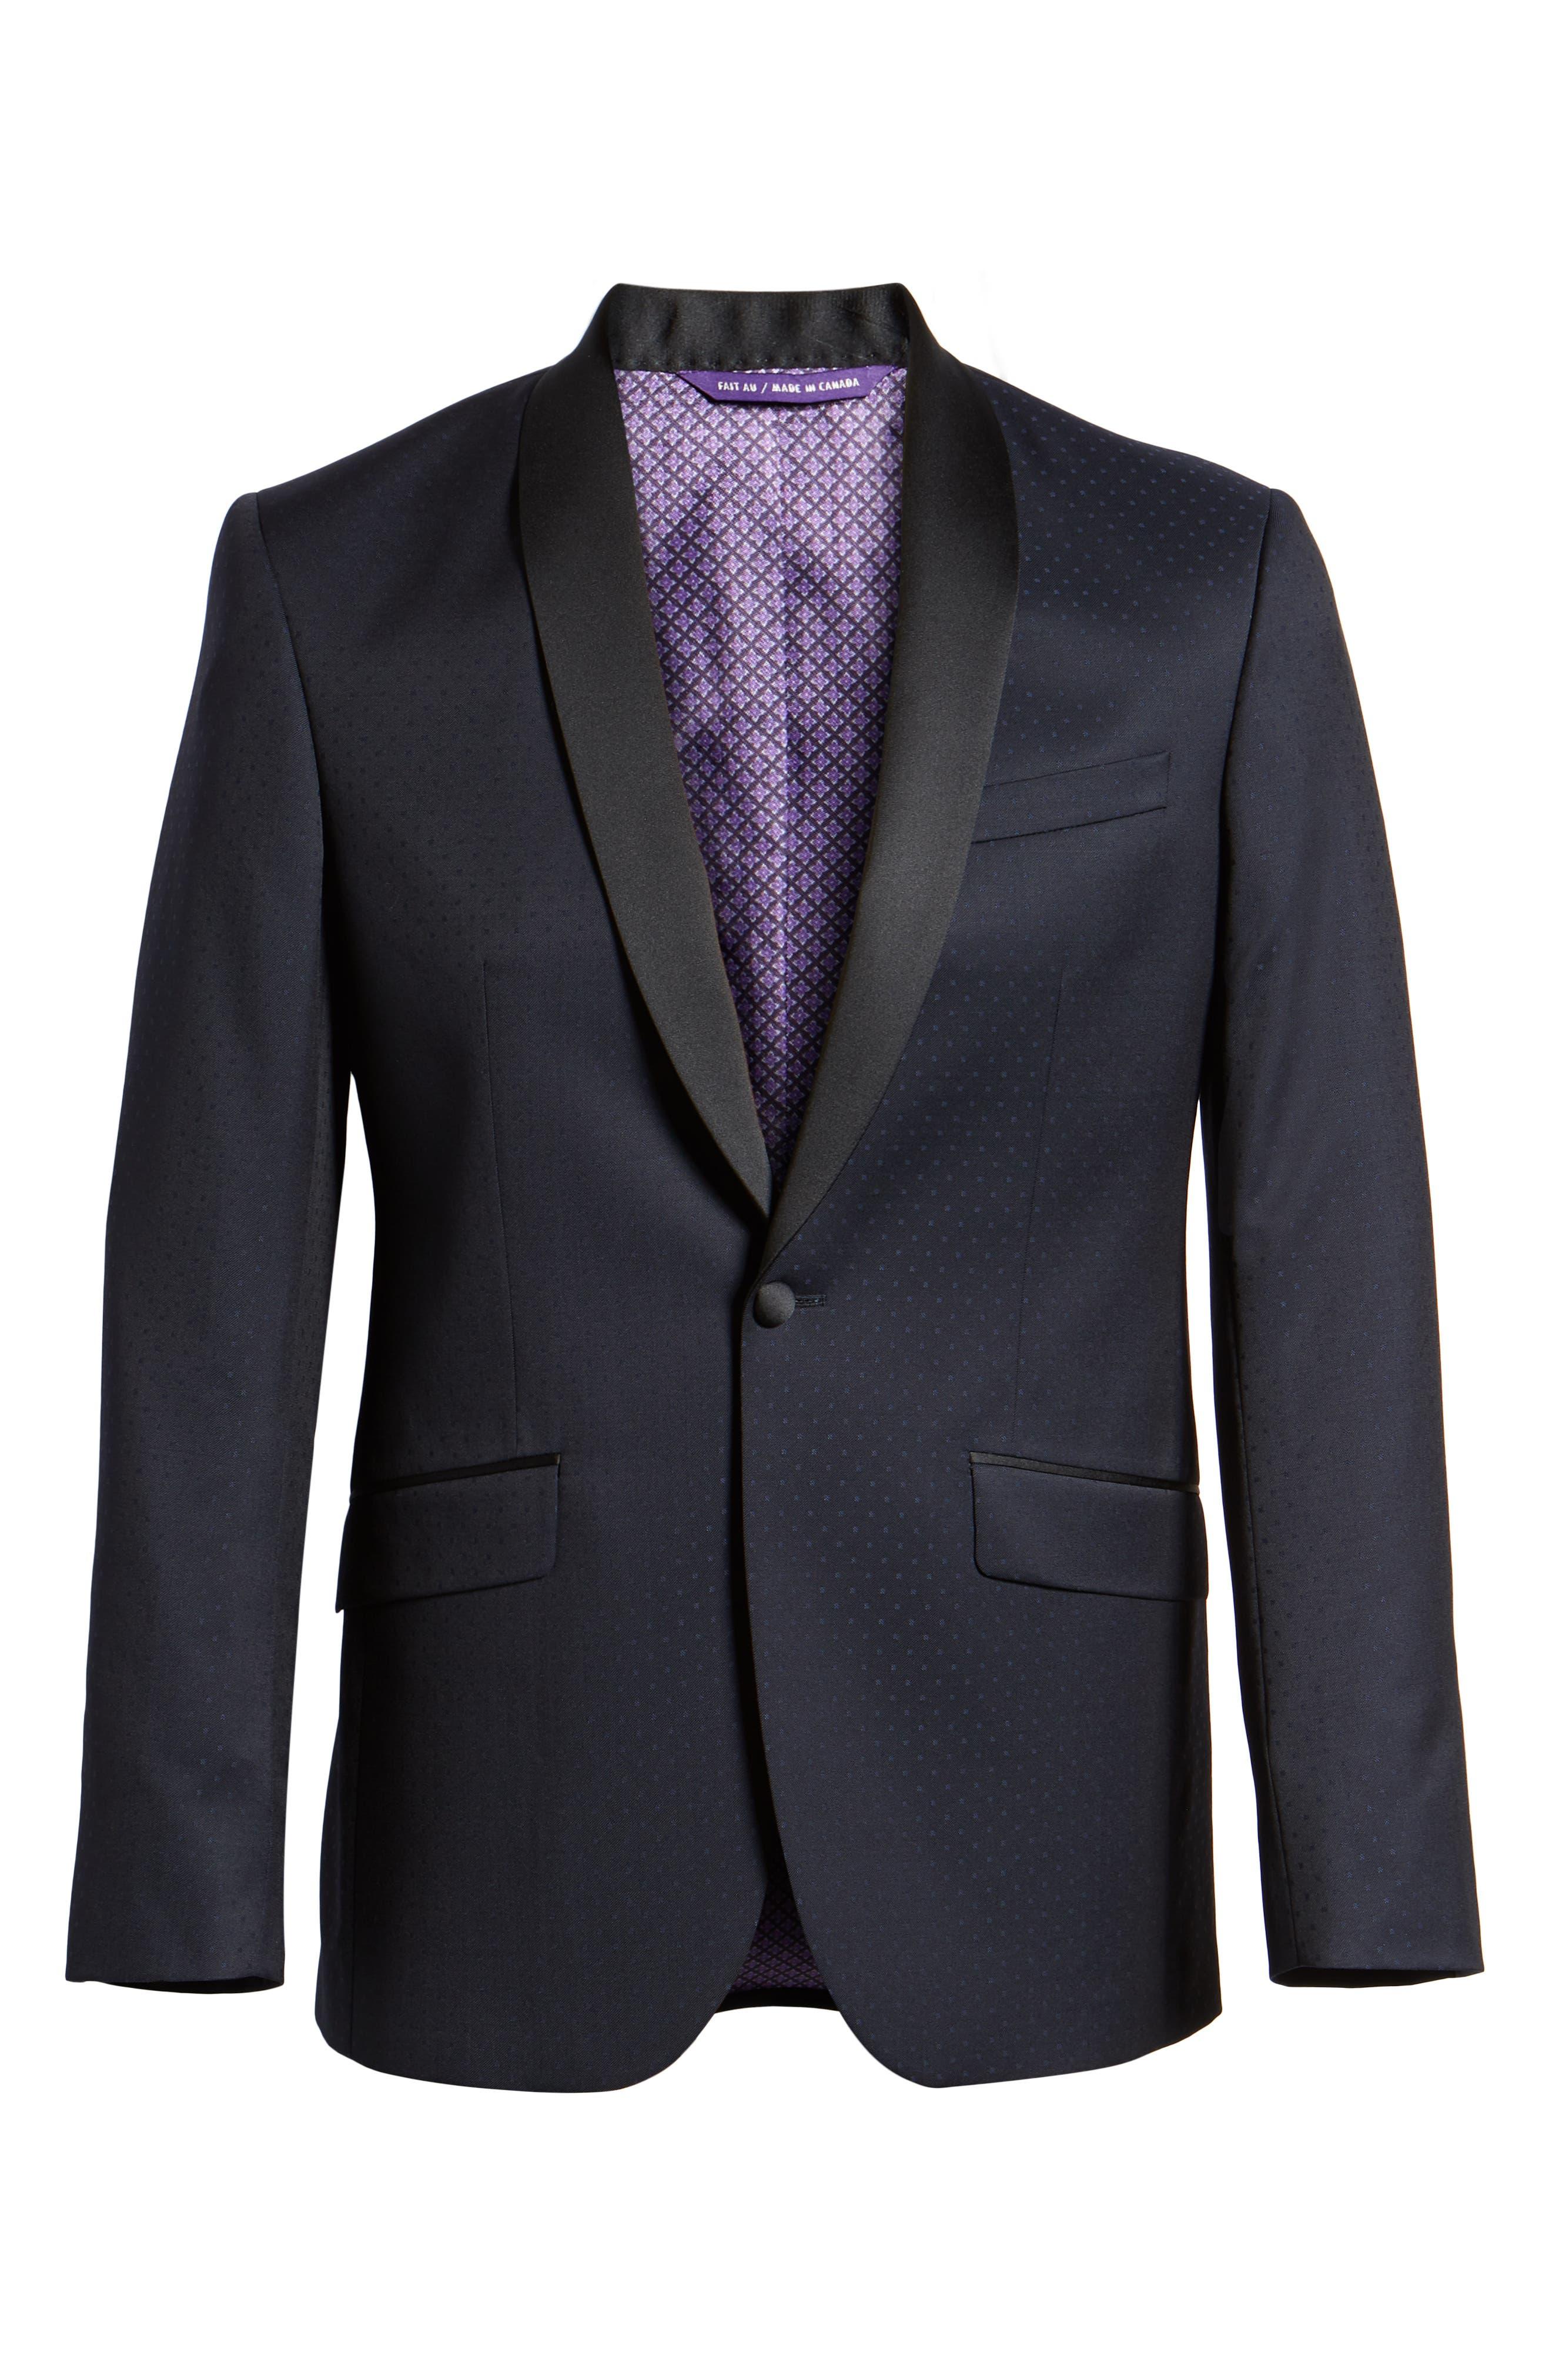 Josh Trim Fit Shawl Collar Wool Dinner Jacket,                             Alternate thumbnail 5, color,                             NAVY